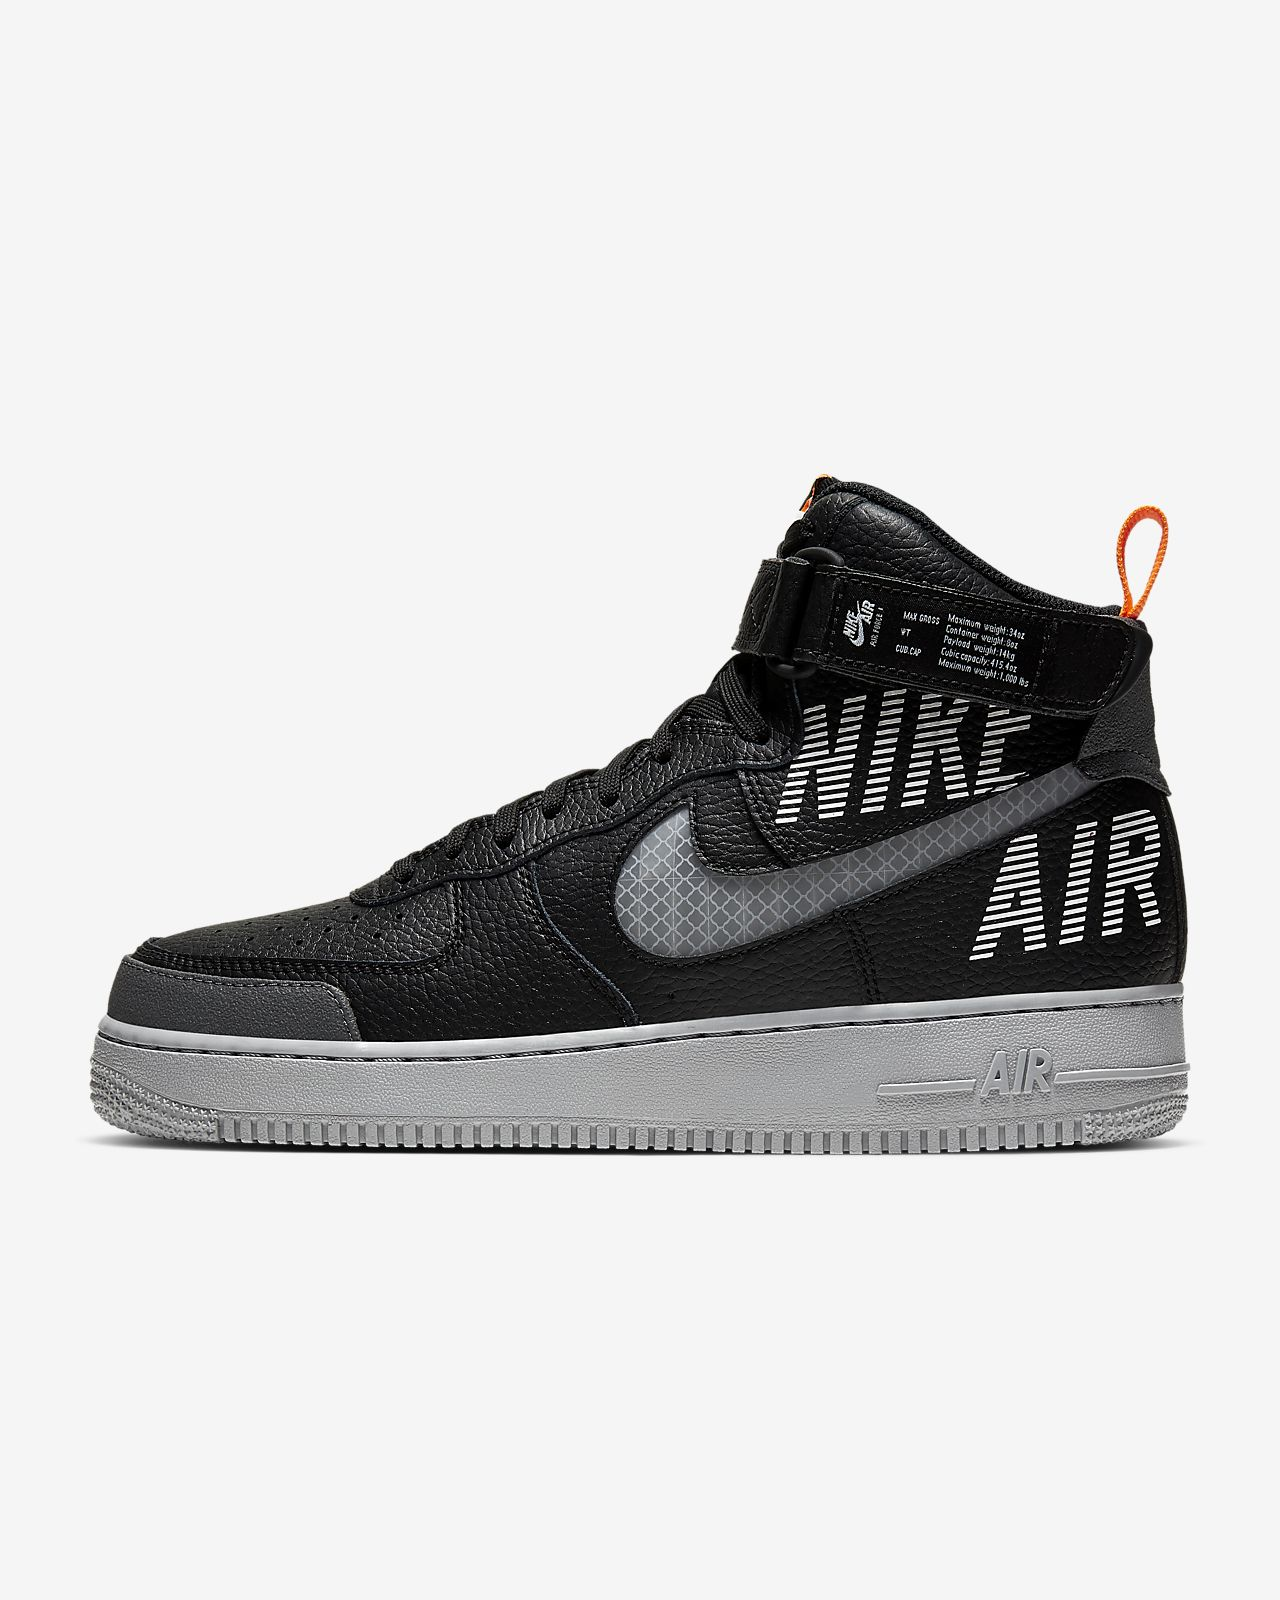 Nike Air Force 1 High '07 LV8 2 Men's Shoe